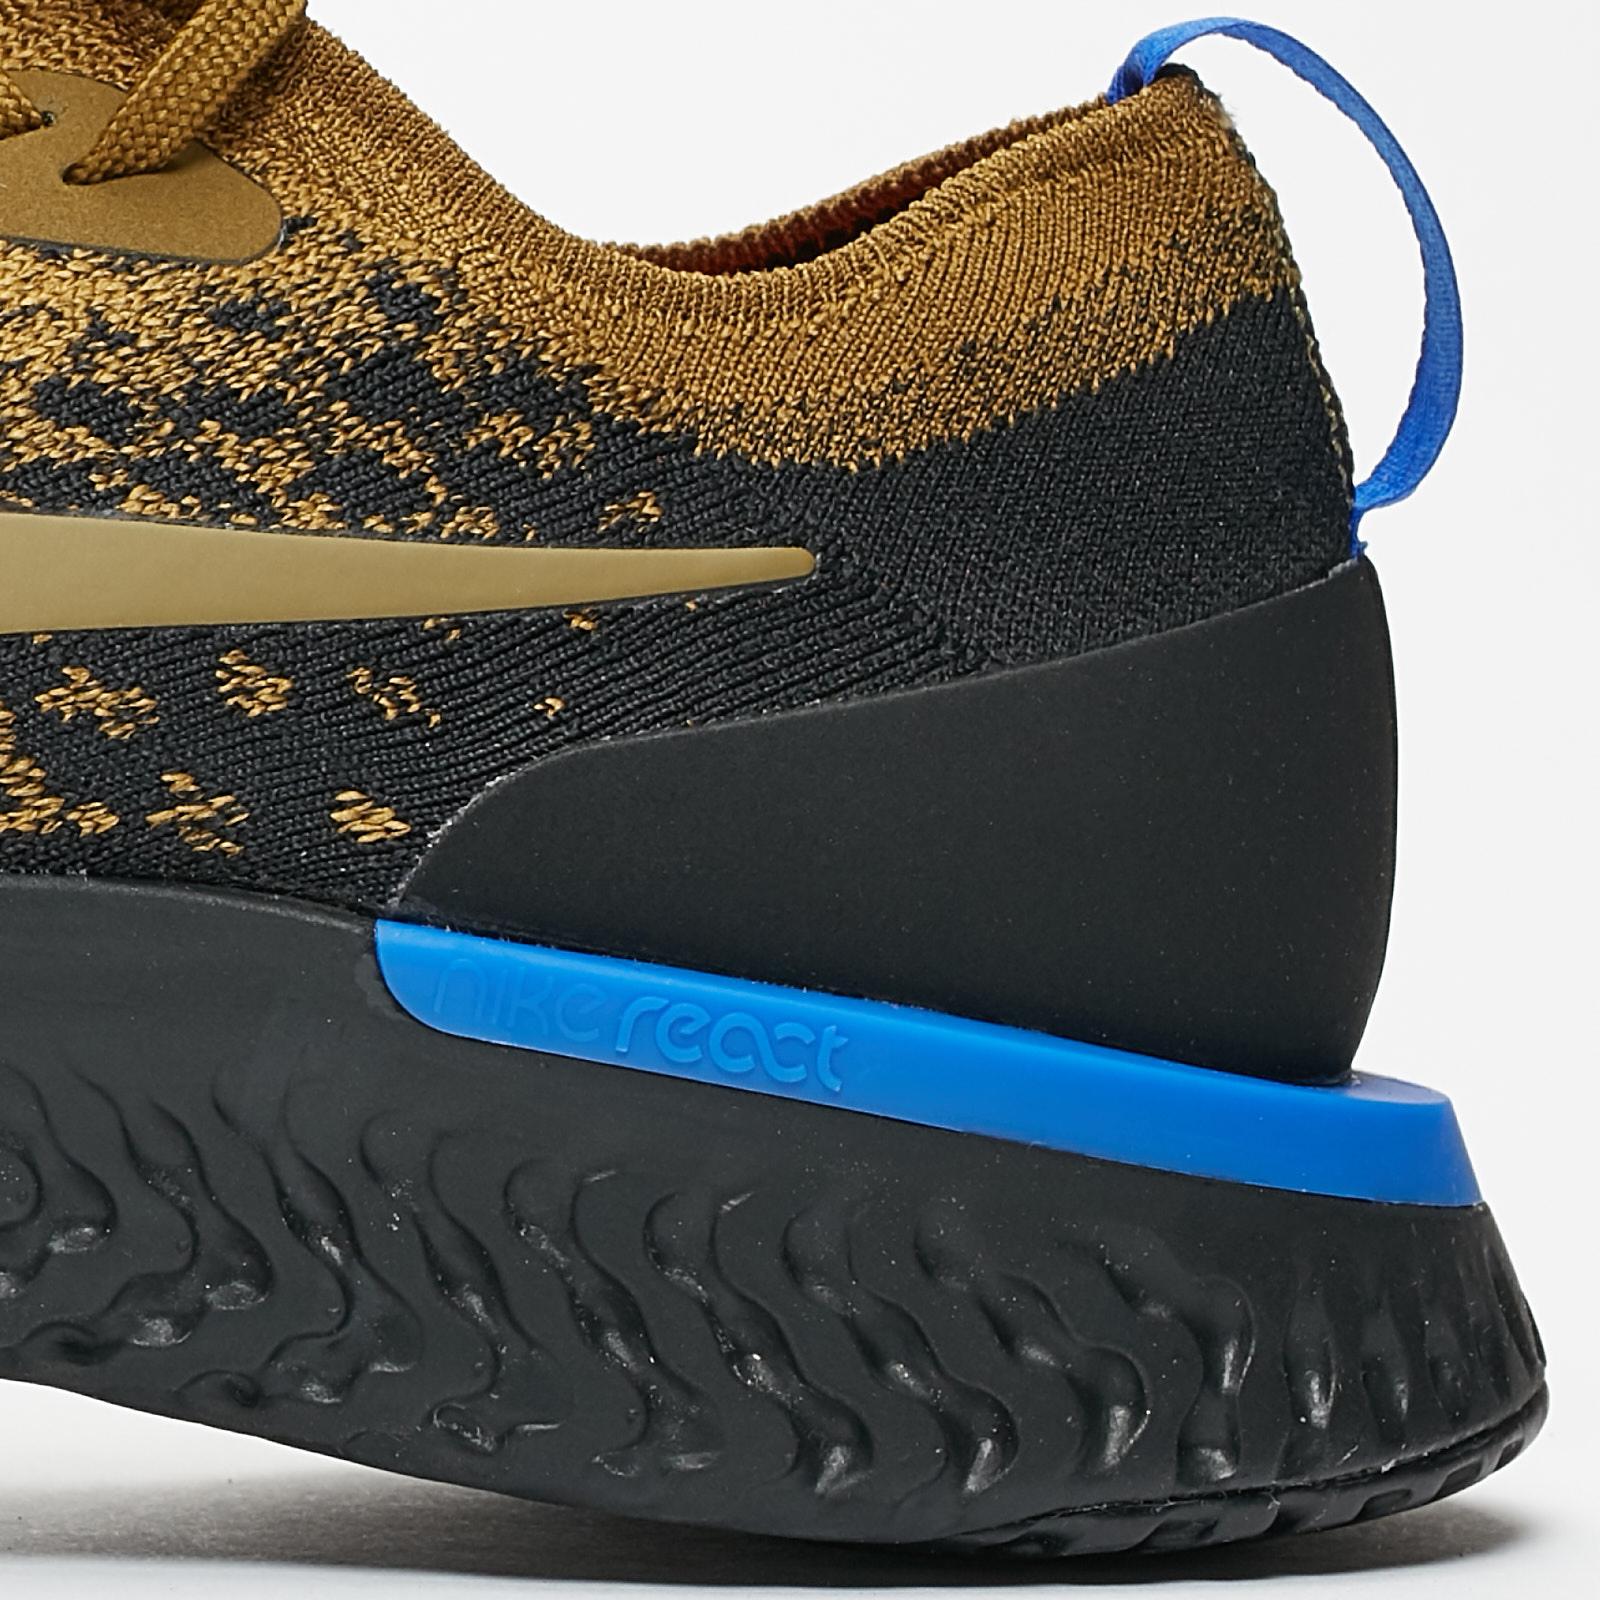 the best attitude 8c8b0 1712a Nike Epic React Flyknit - Aq0067-301 - Sneakersnstuff | sneakers ...